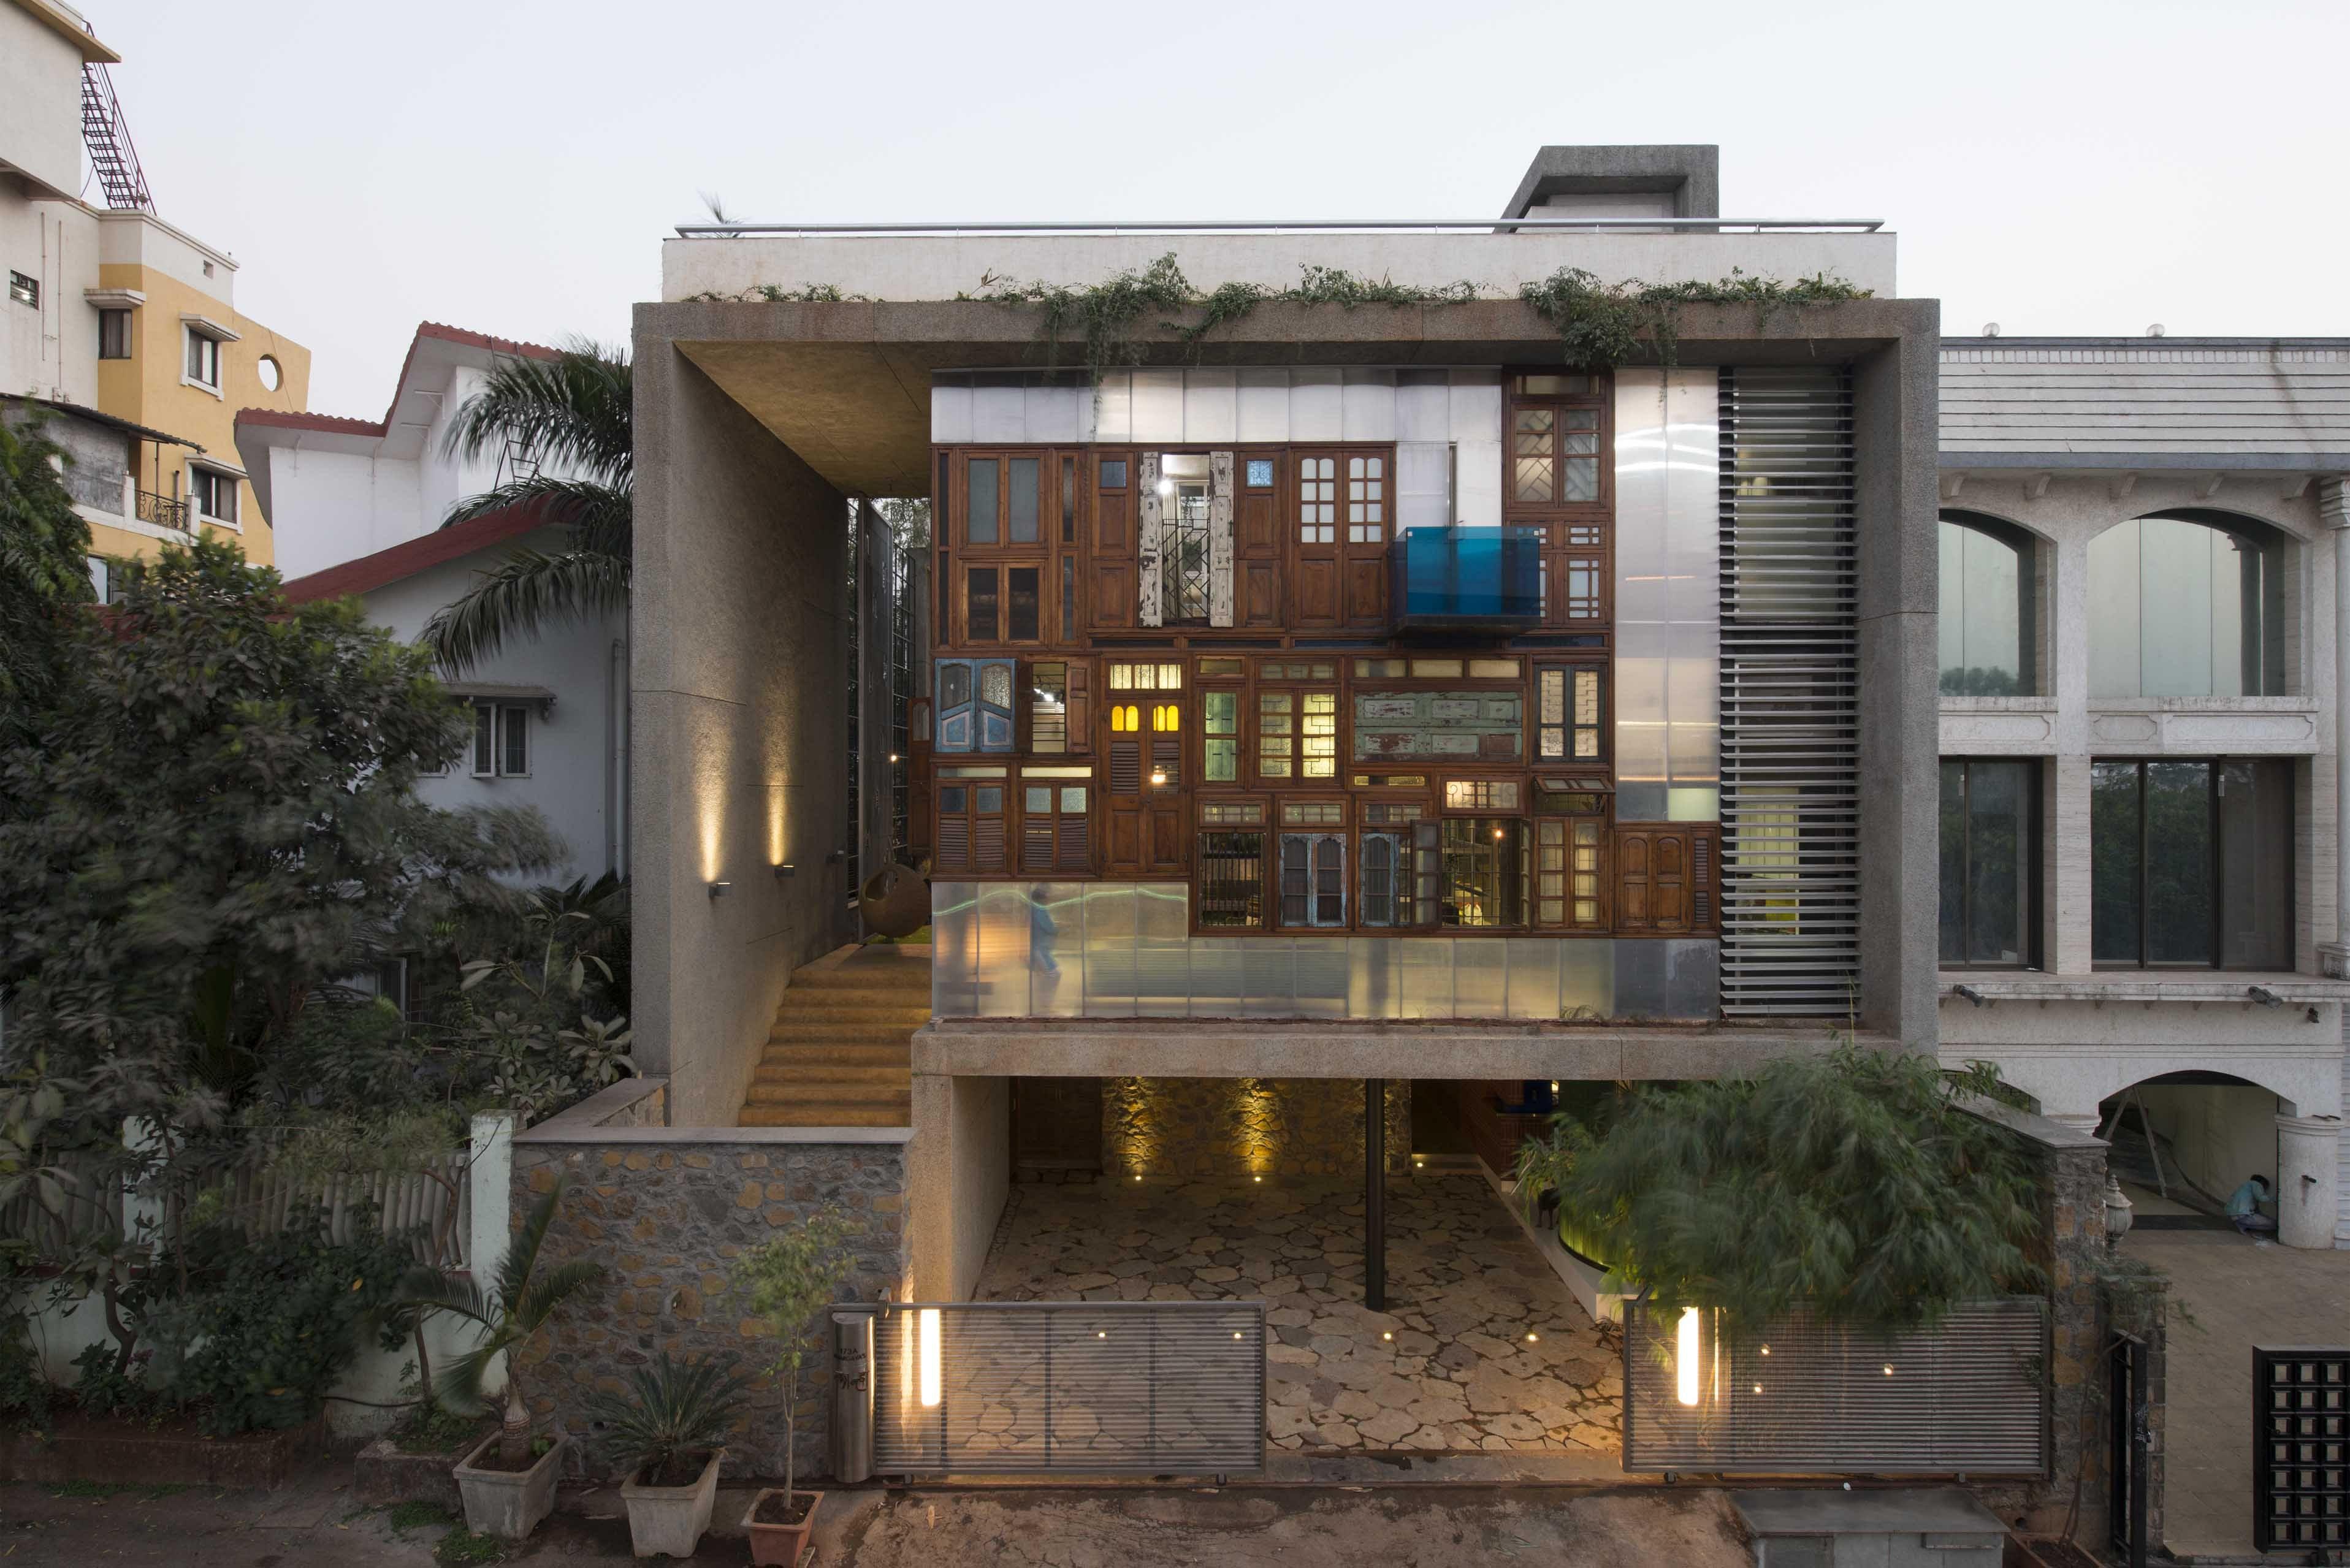 Made From Recycled Waste, Award-Winning Navi Mumbai Home